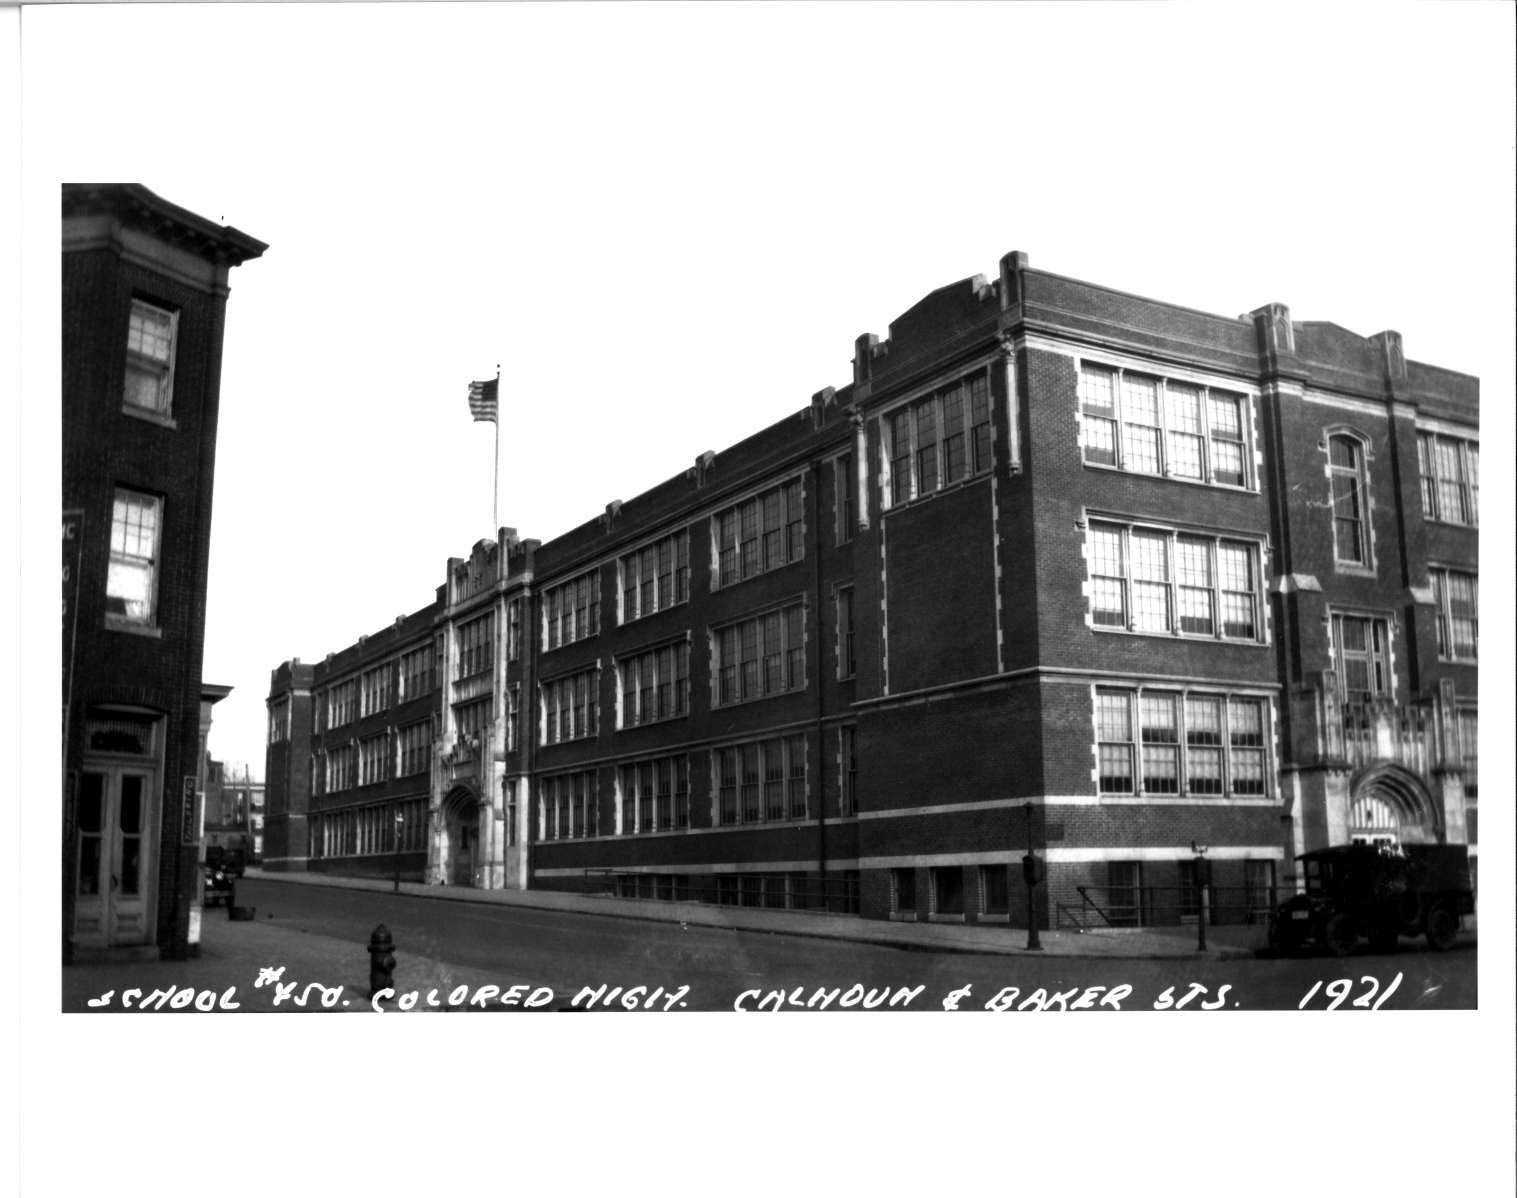 Fileold Frederick Douglass High School 1924 Owens And Sisco